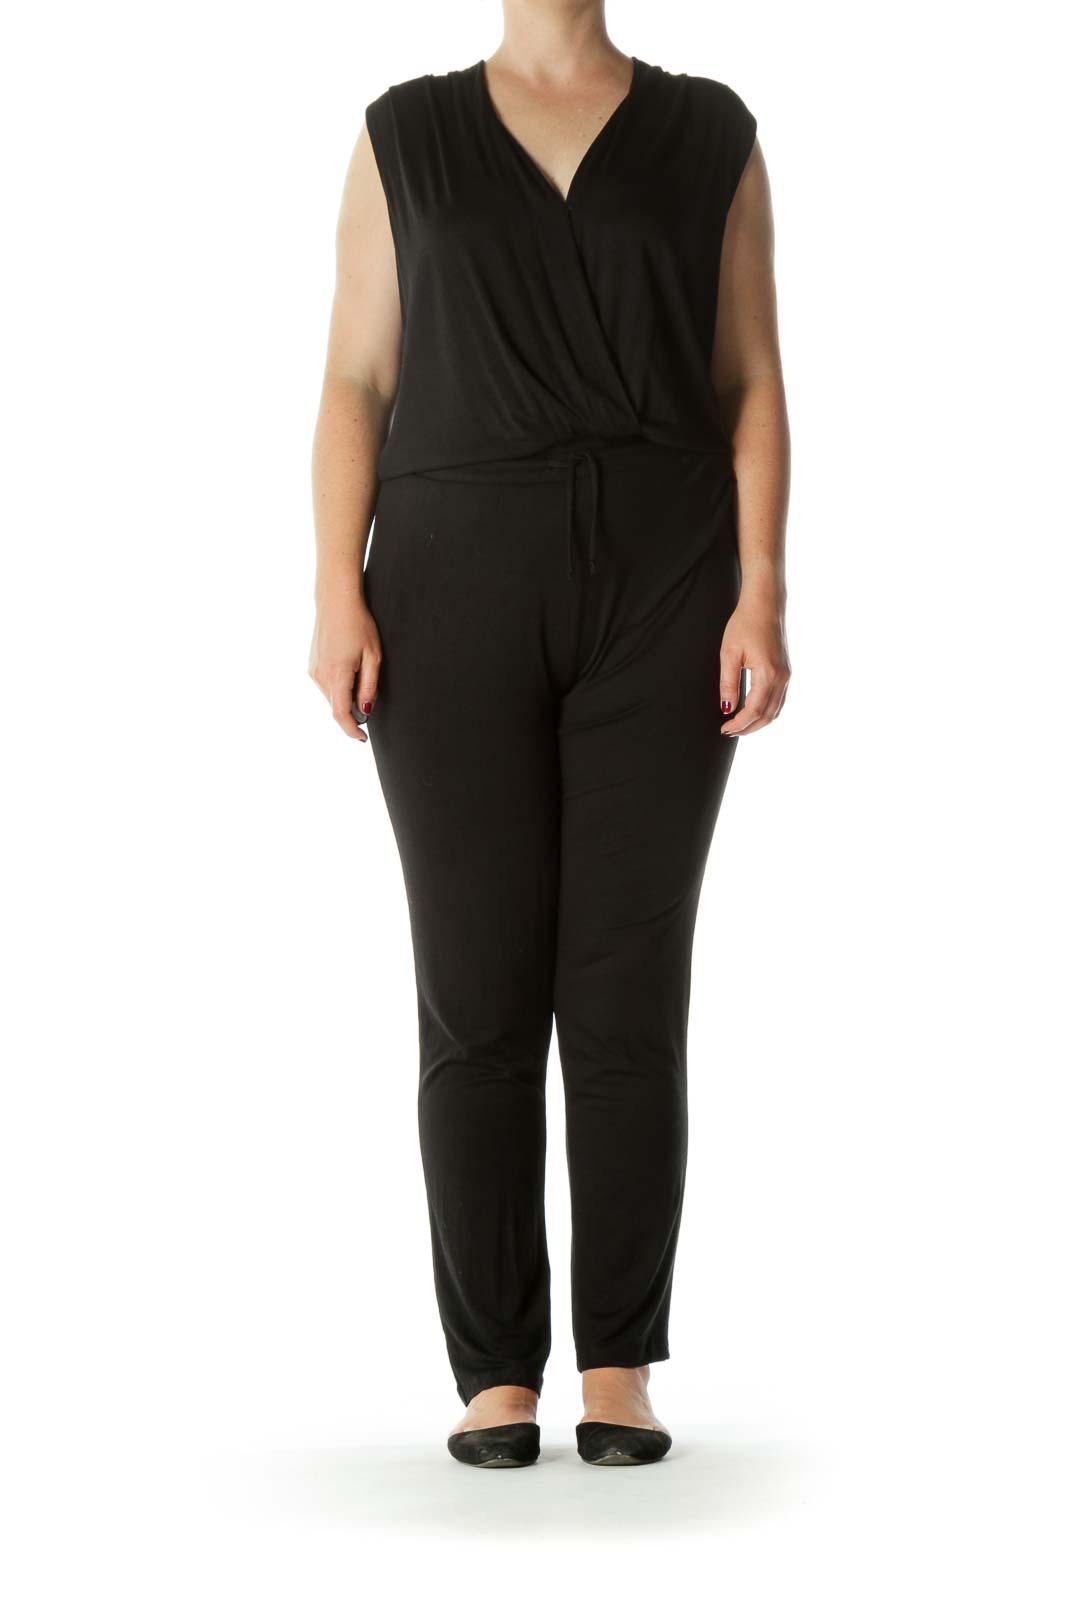 Black Super Soft-Texture Pocketed Drawstring Stretch Yoga Jumpsuit Front